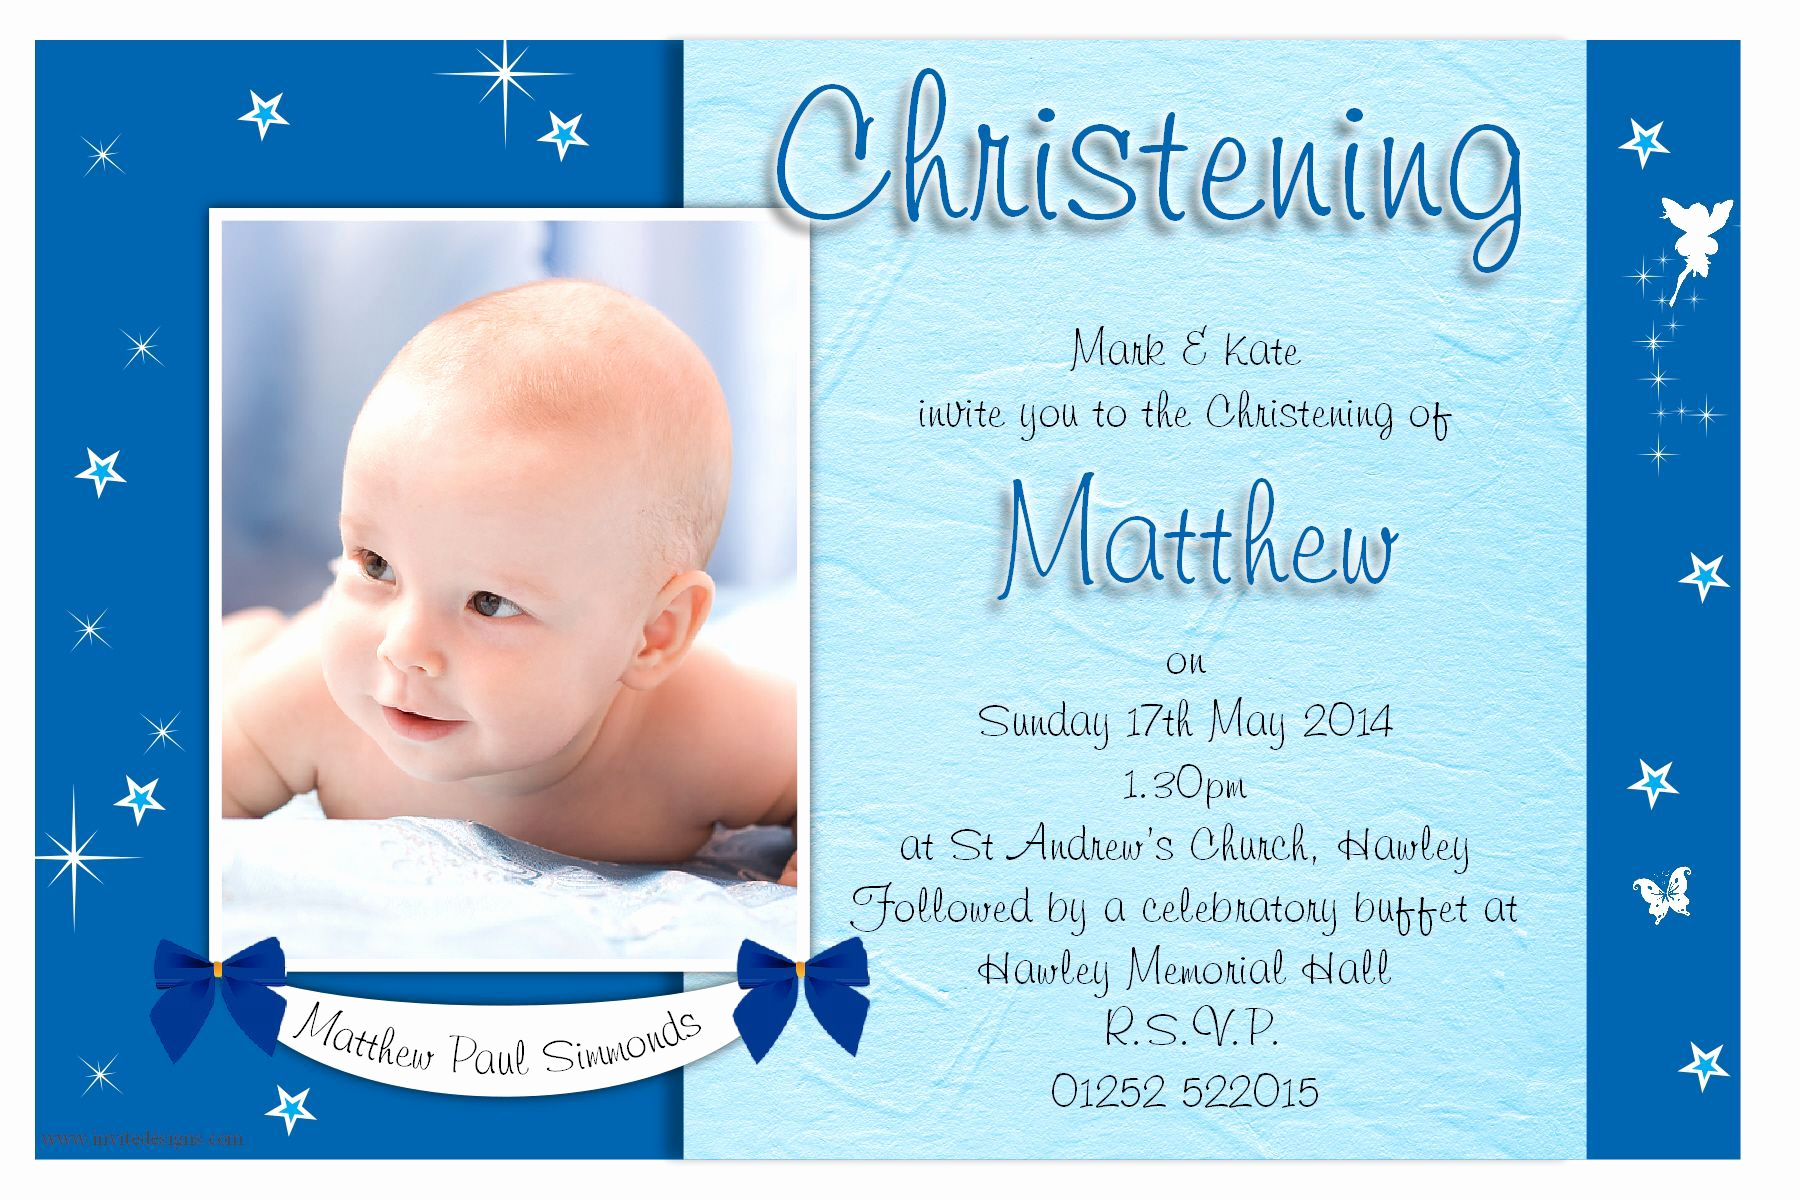 Free Christening Invitation Templates Luxury Free Christening Invitation Template Printable